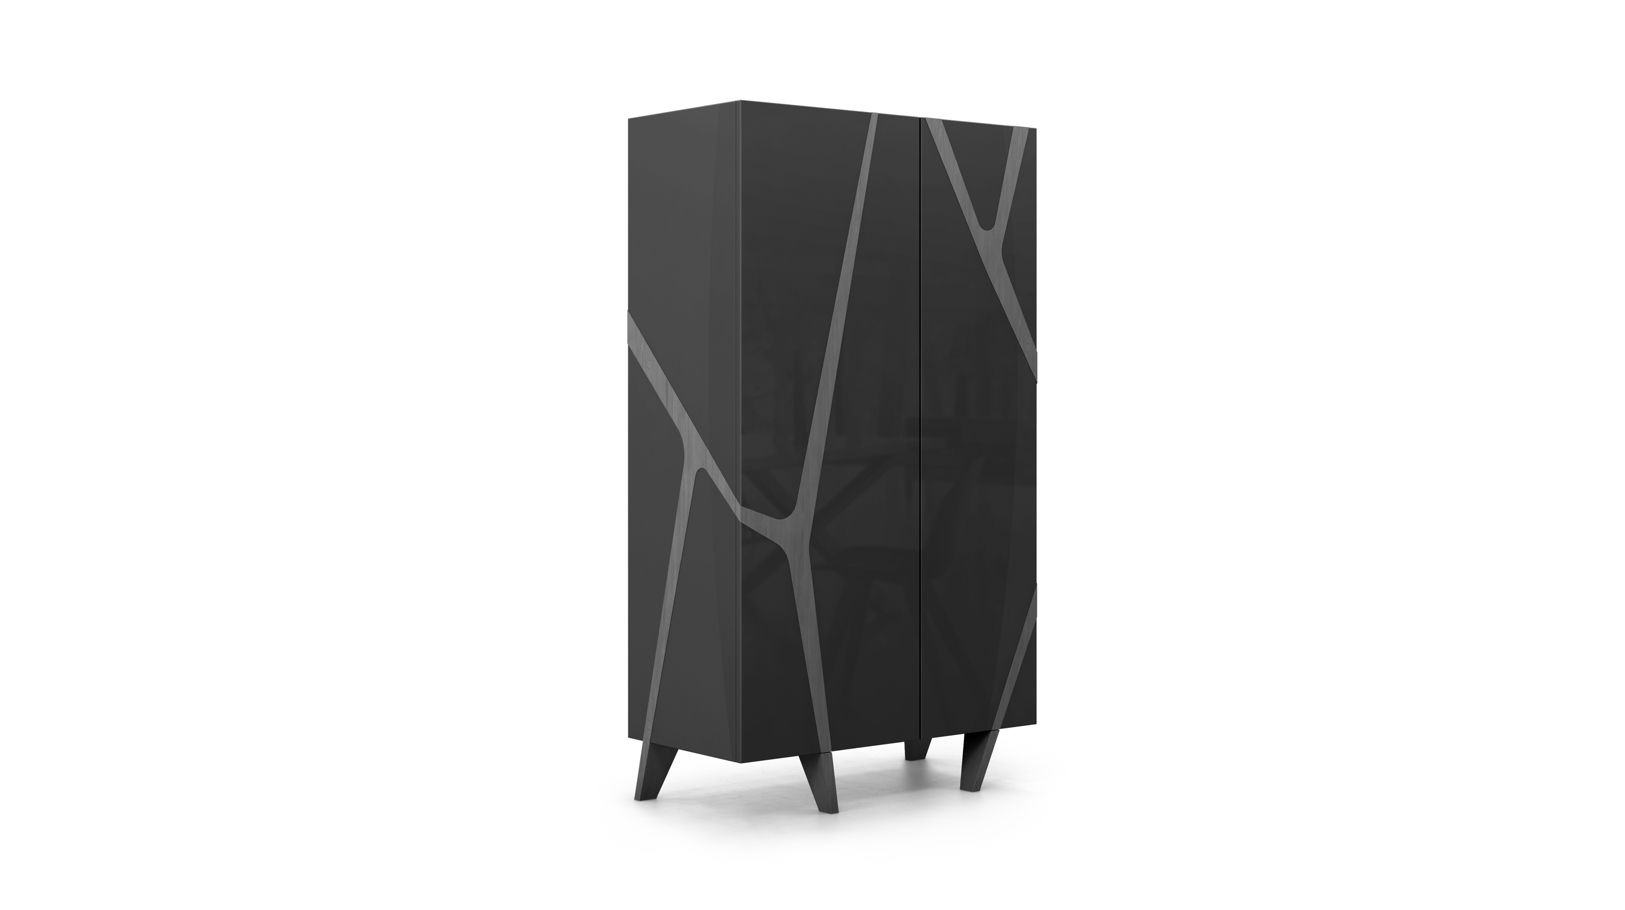 armoire mangrove roche bobois. Black Bedroom Furniture Sets. Home Design Ideas